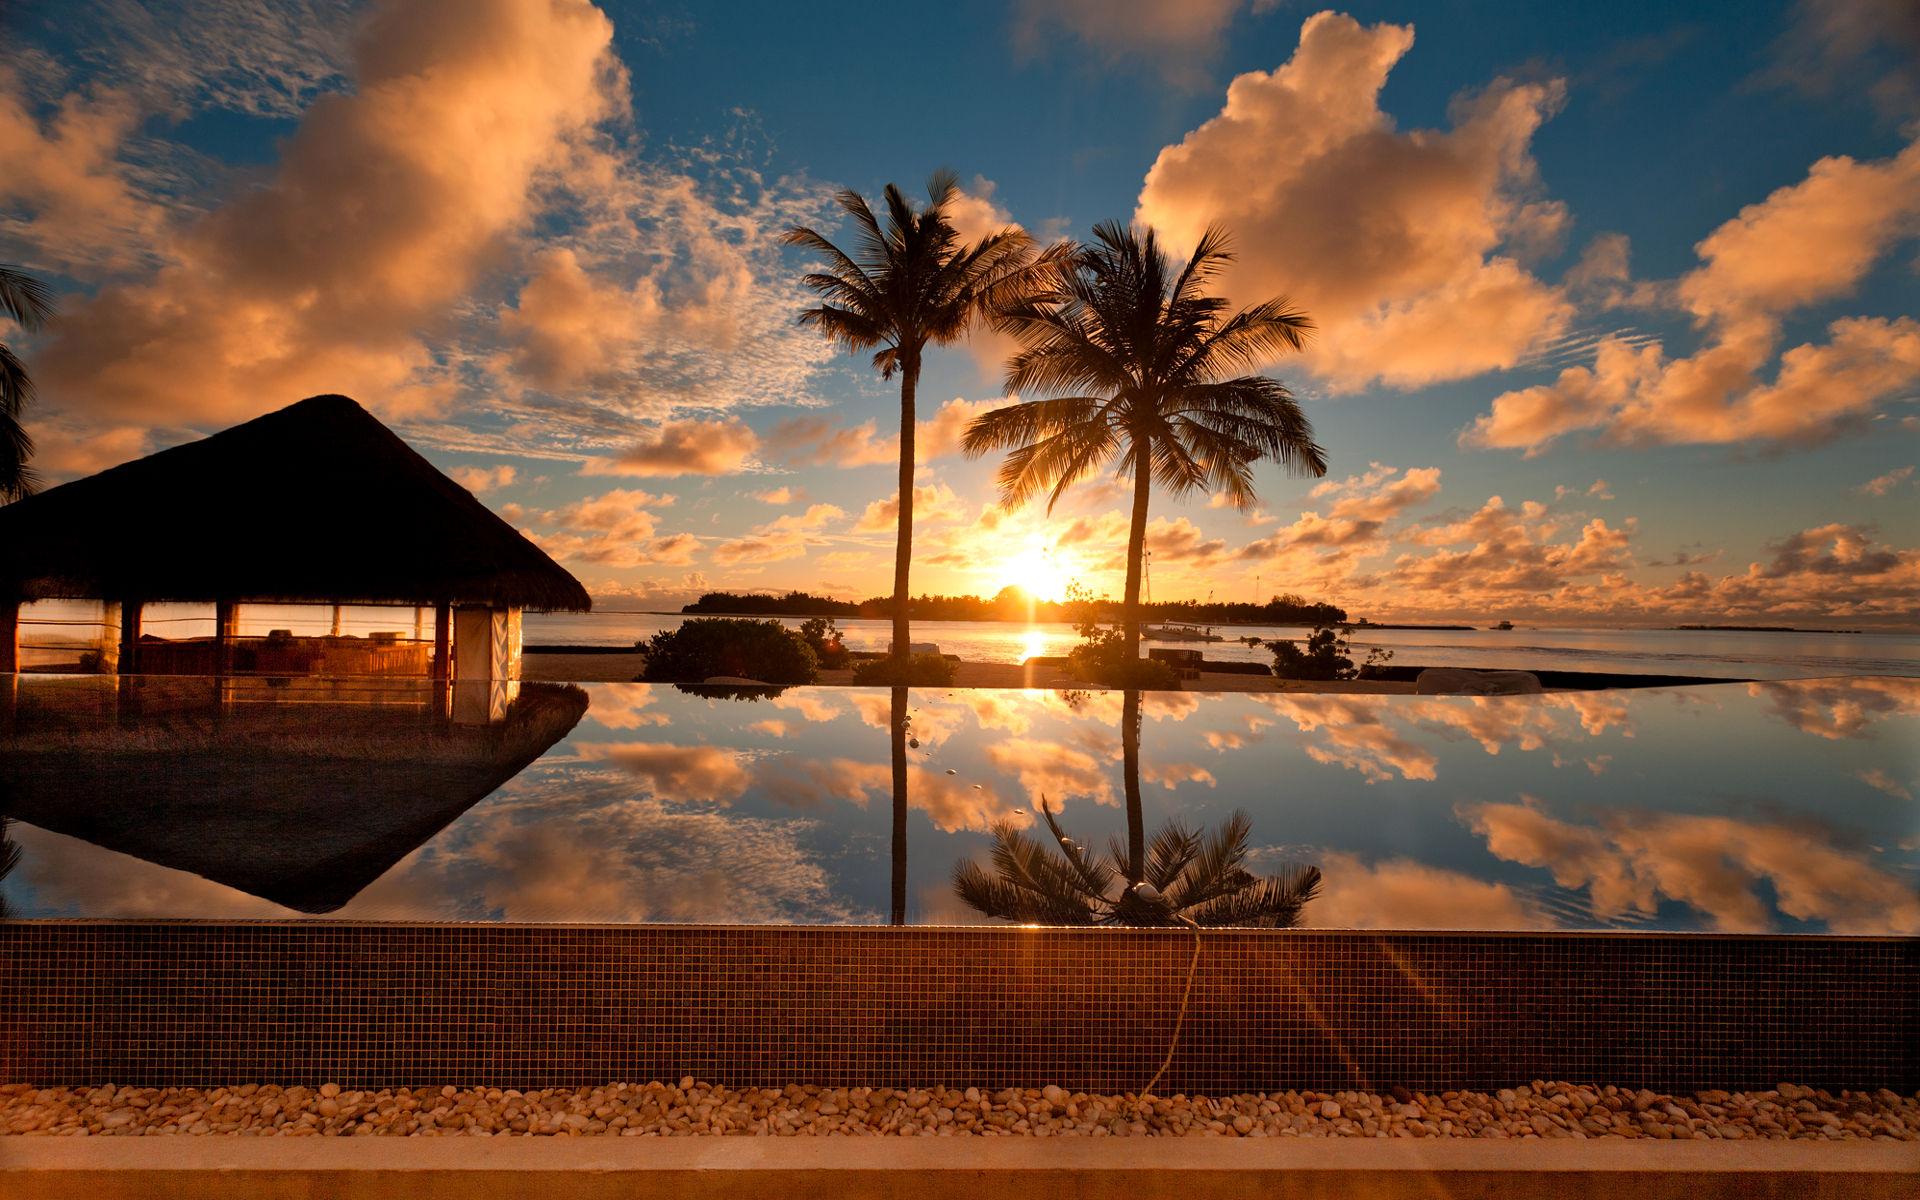 Backgrounds Sunset At Palm Beach Nature Beautiful Desktop